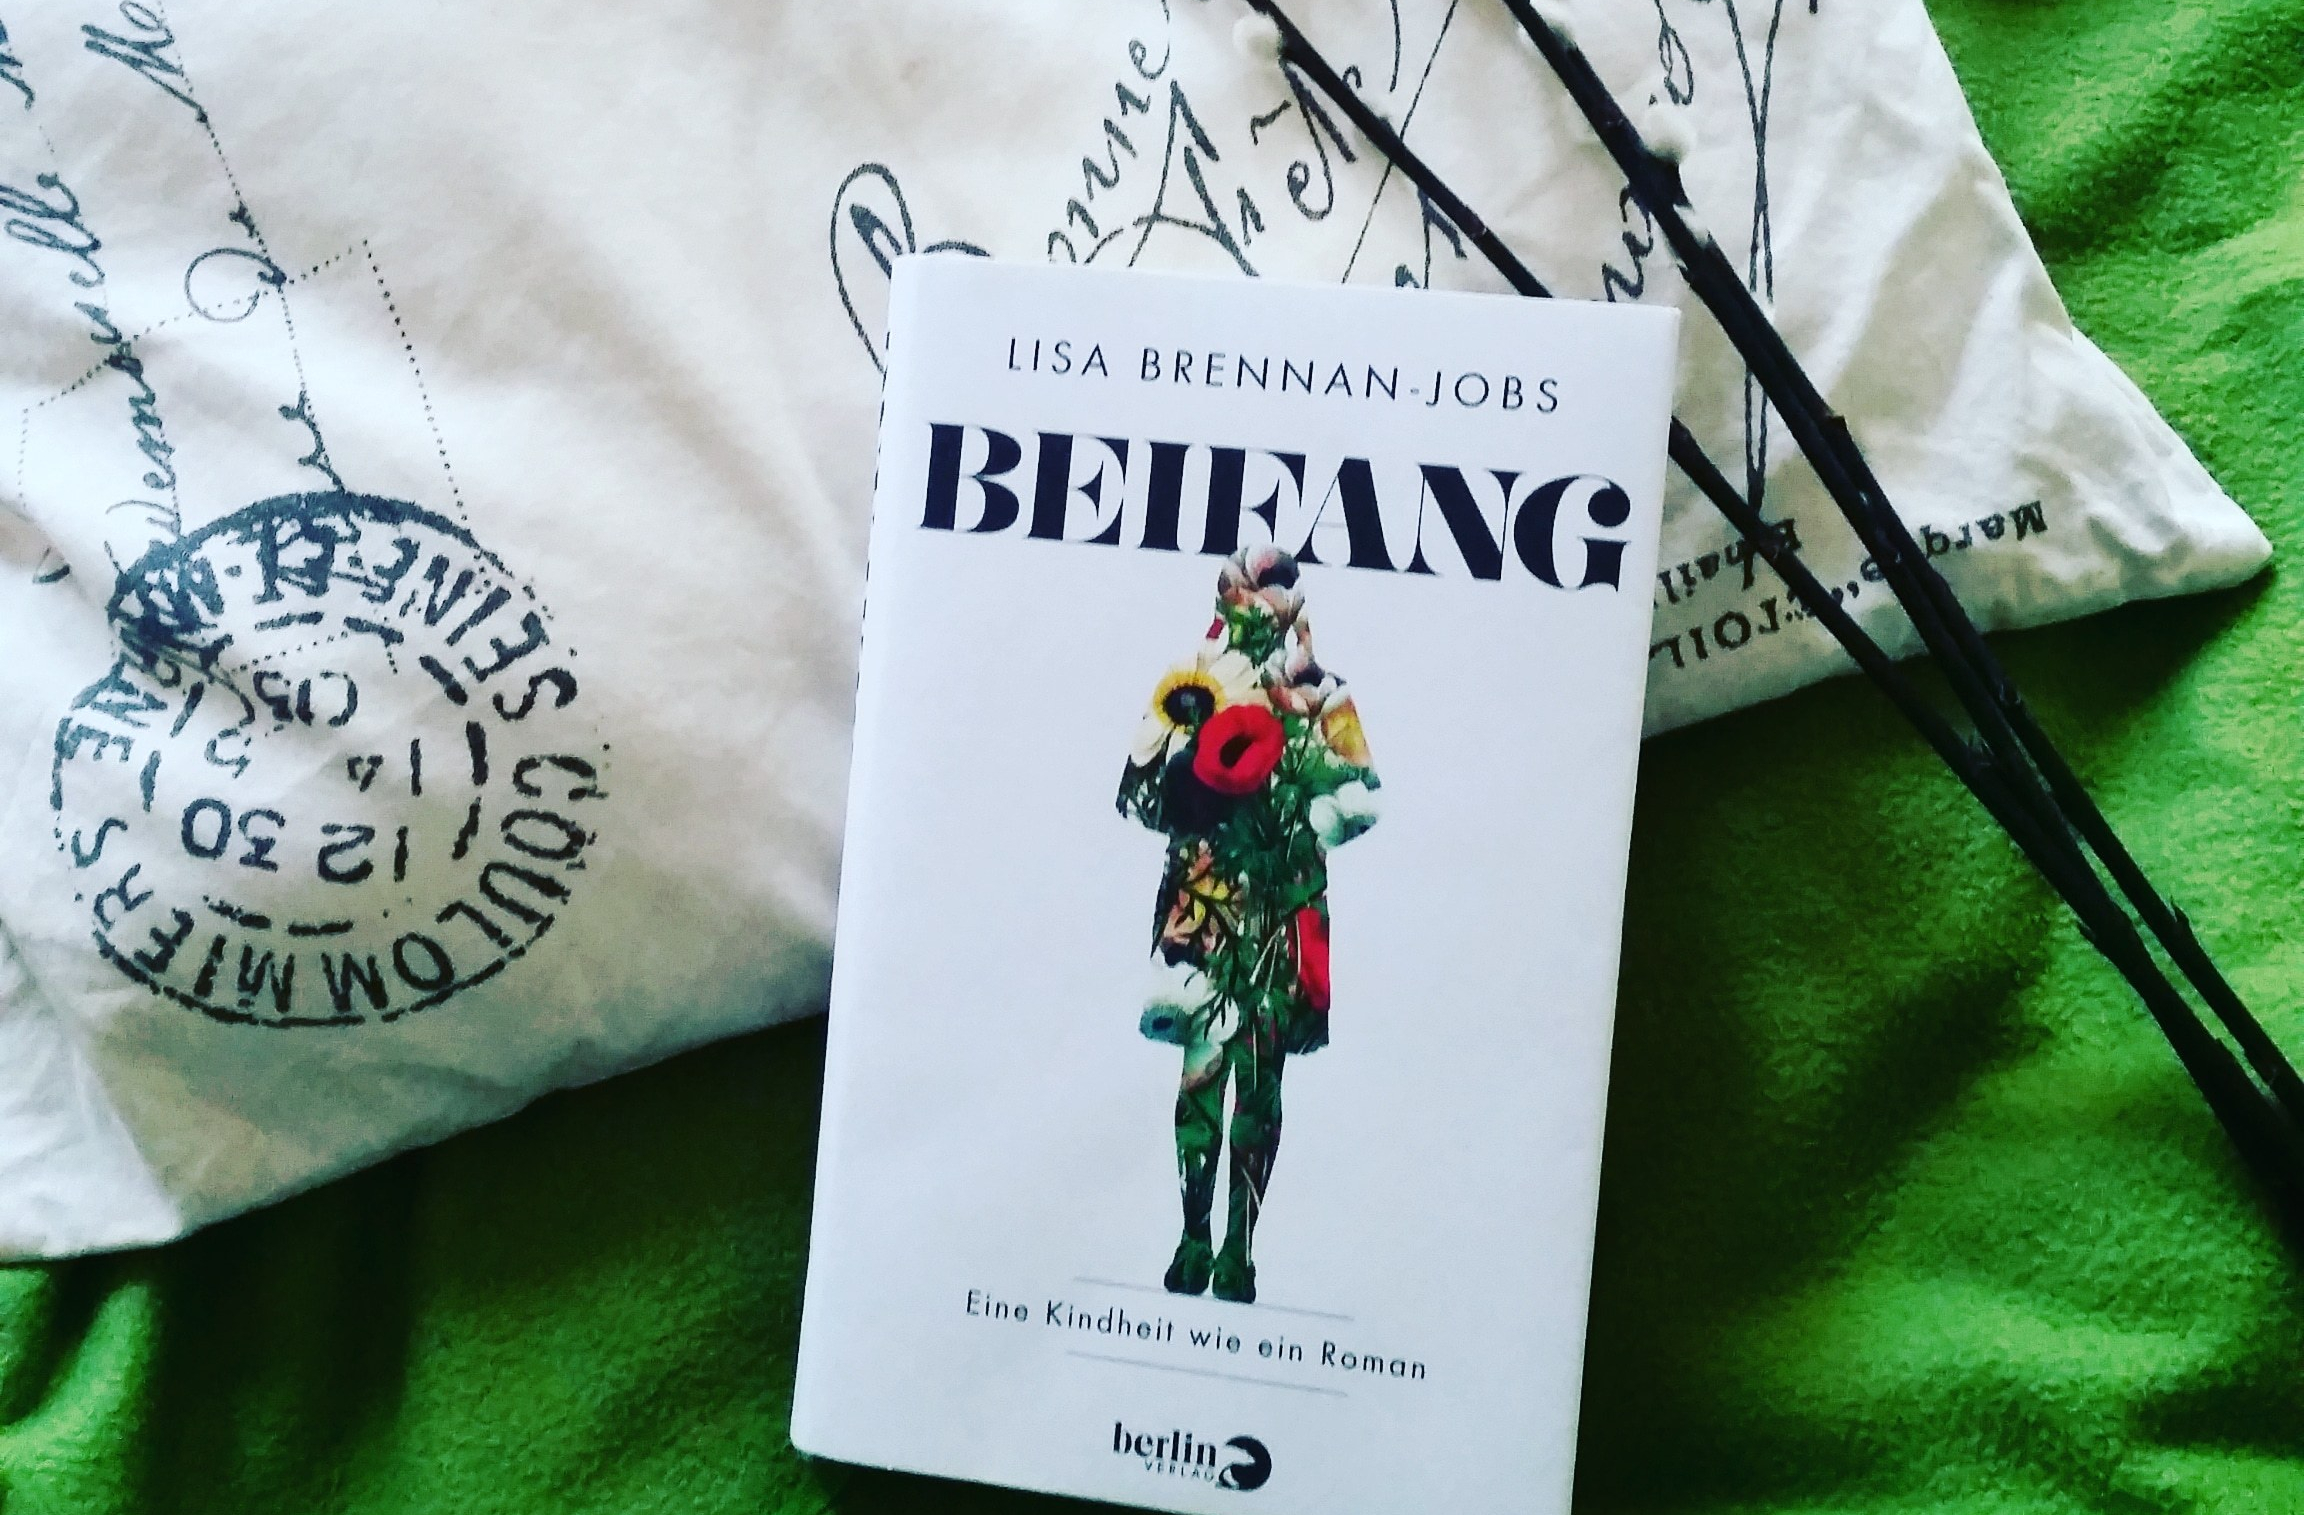 Beifang: Lisa Brennan Jobs, Rezension